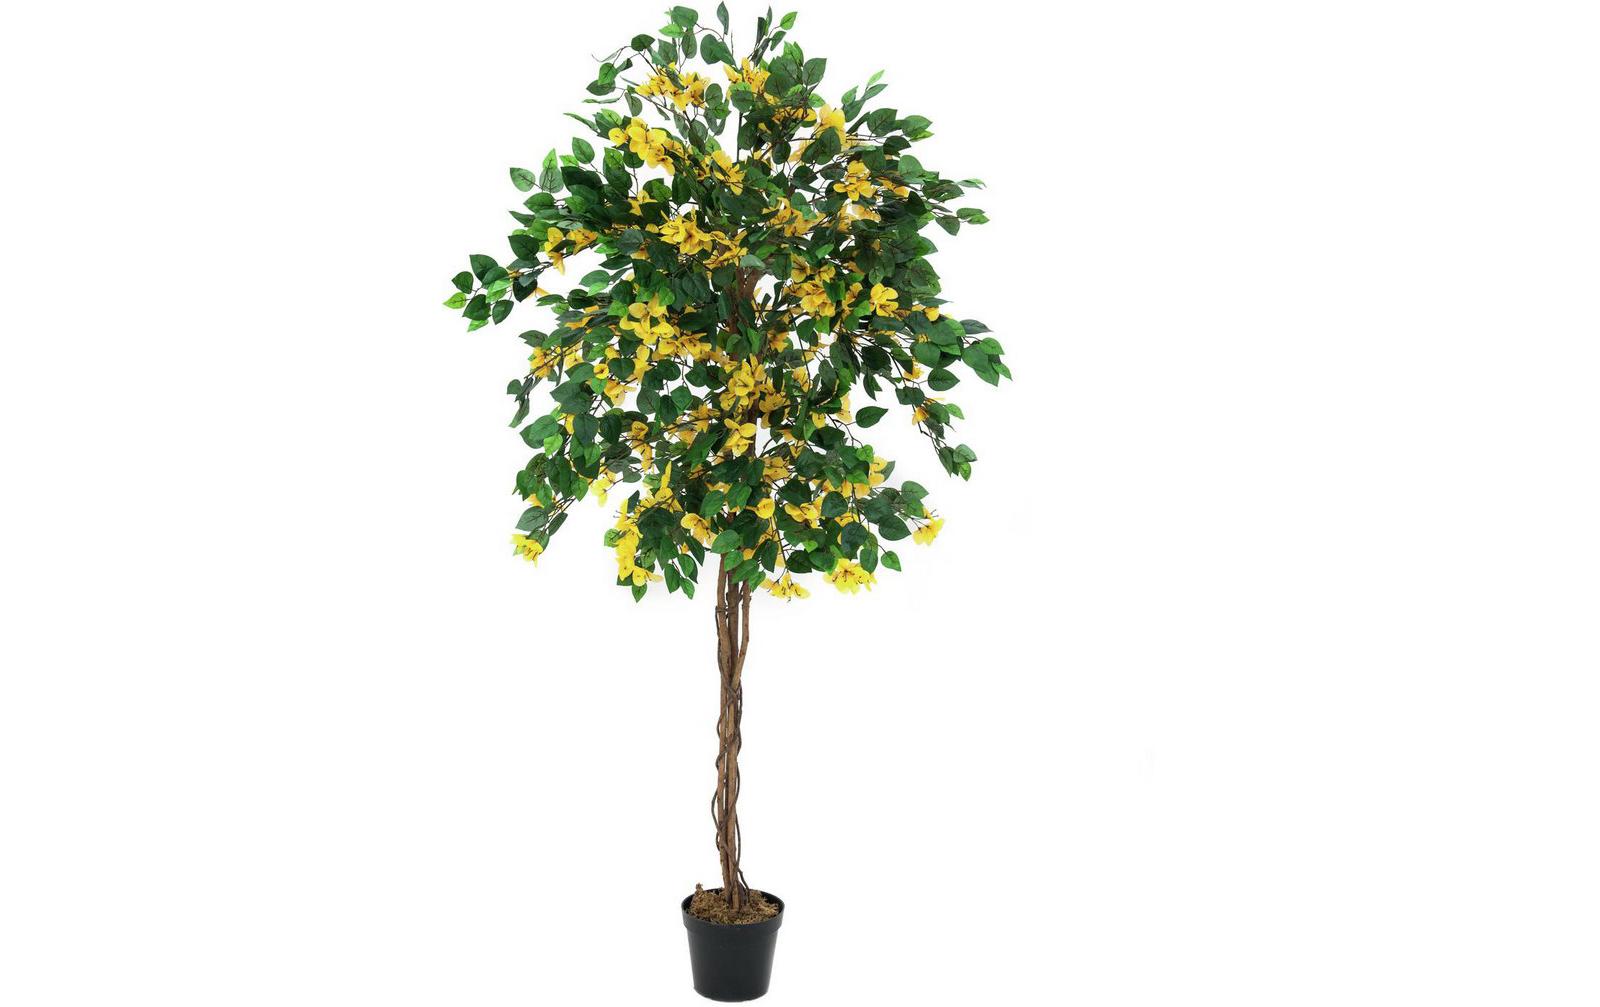 europalms-bougainvillea-gelb-150cm-kunststoffpflanze